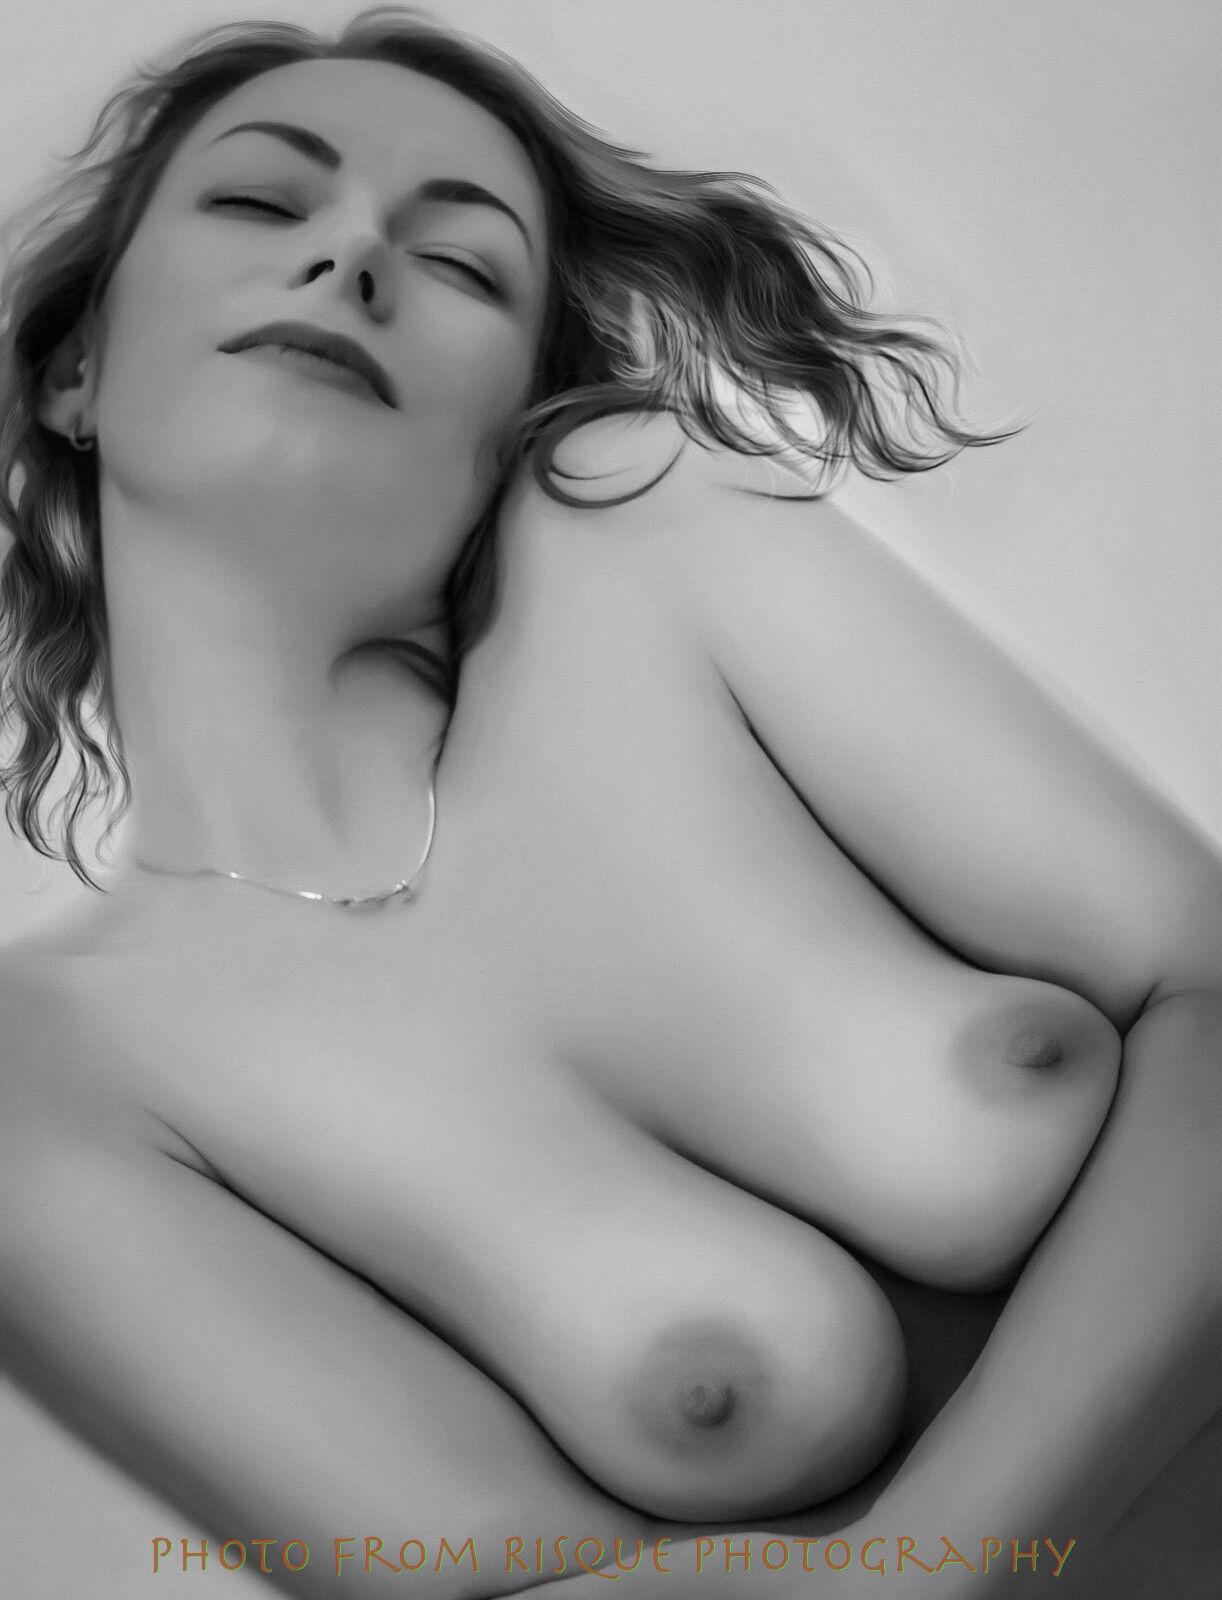 penthouse nude female models